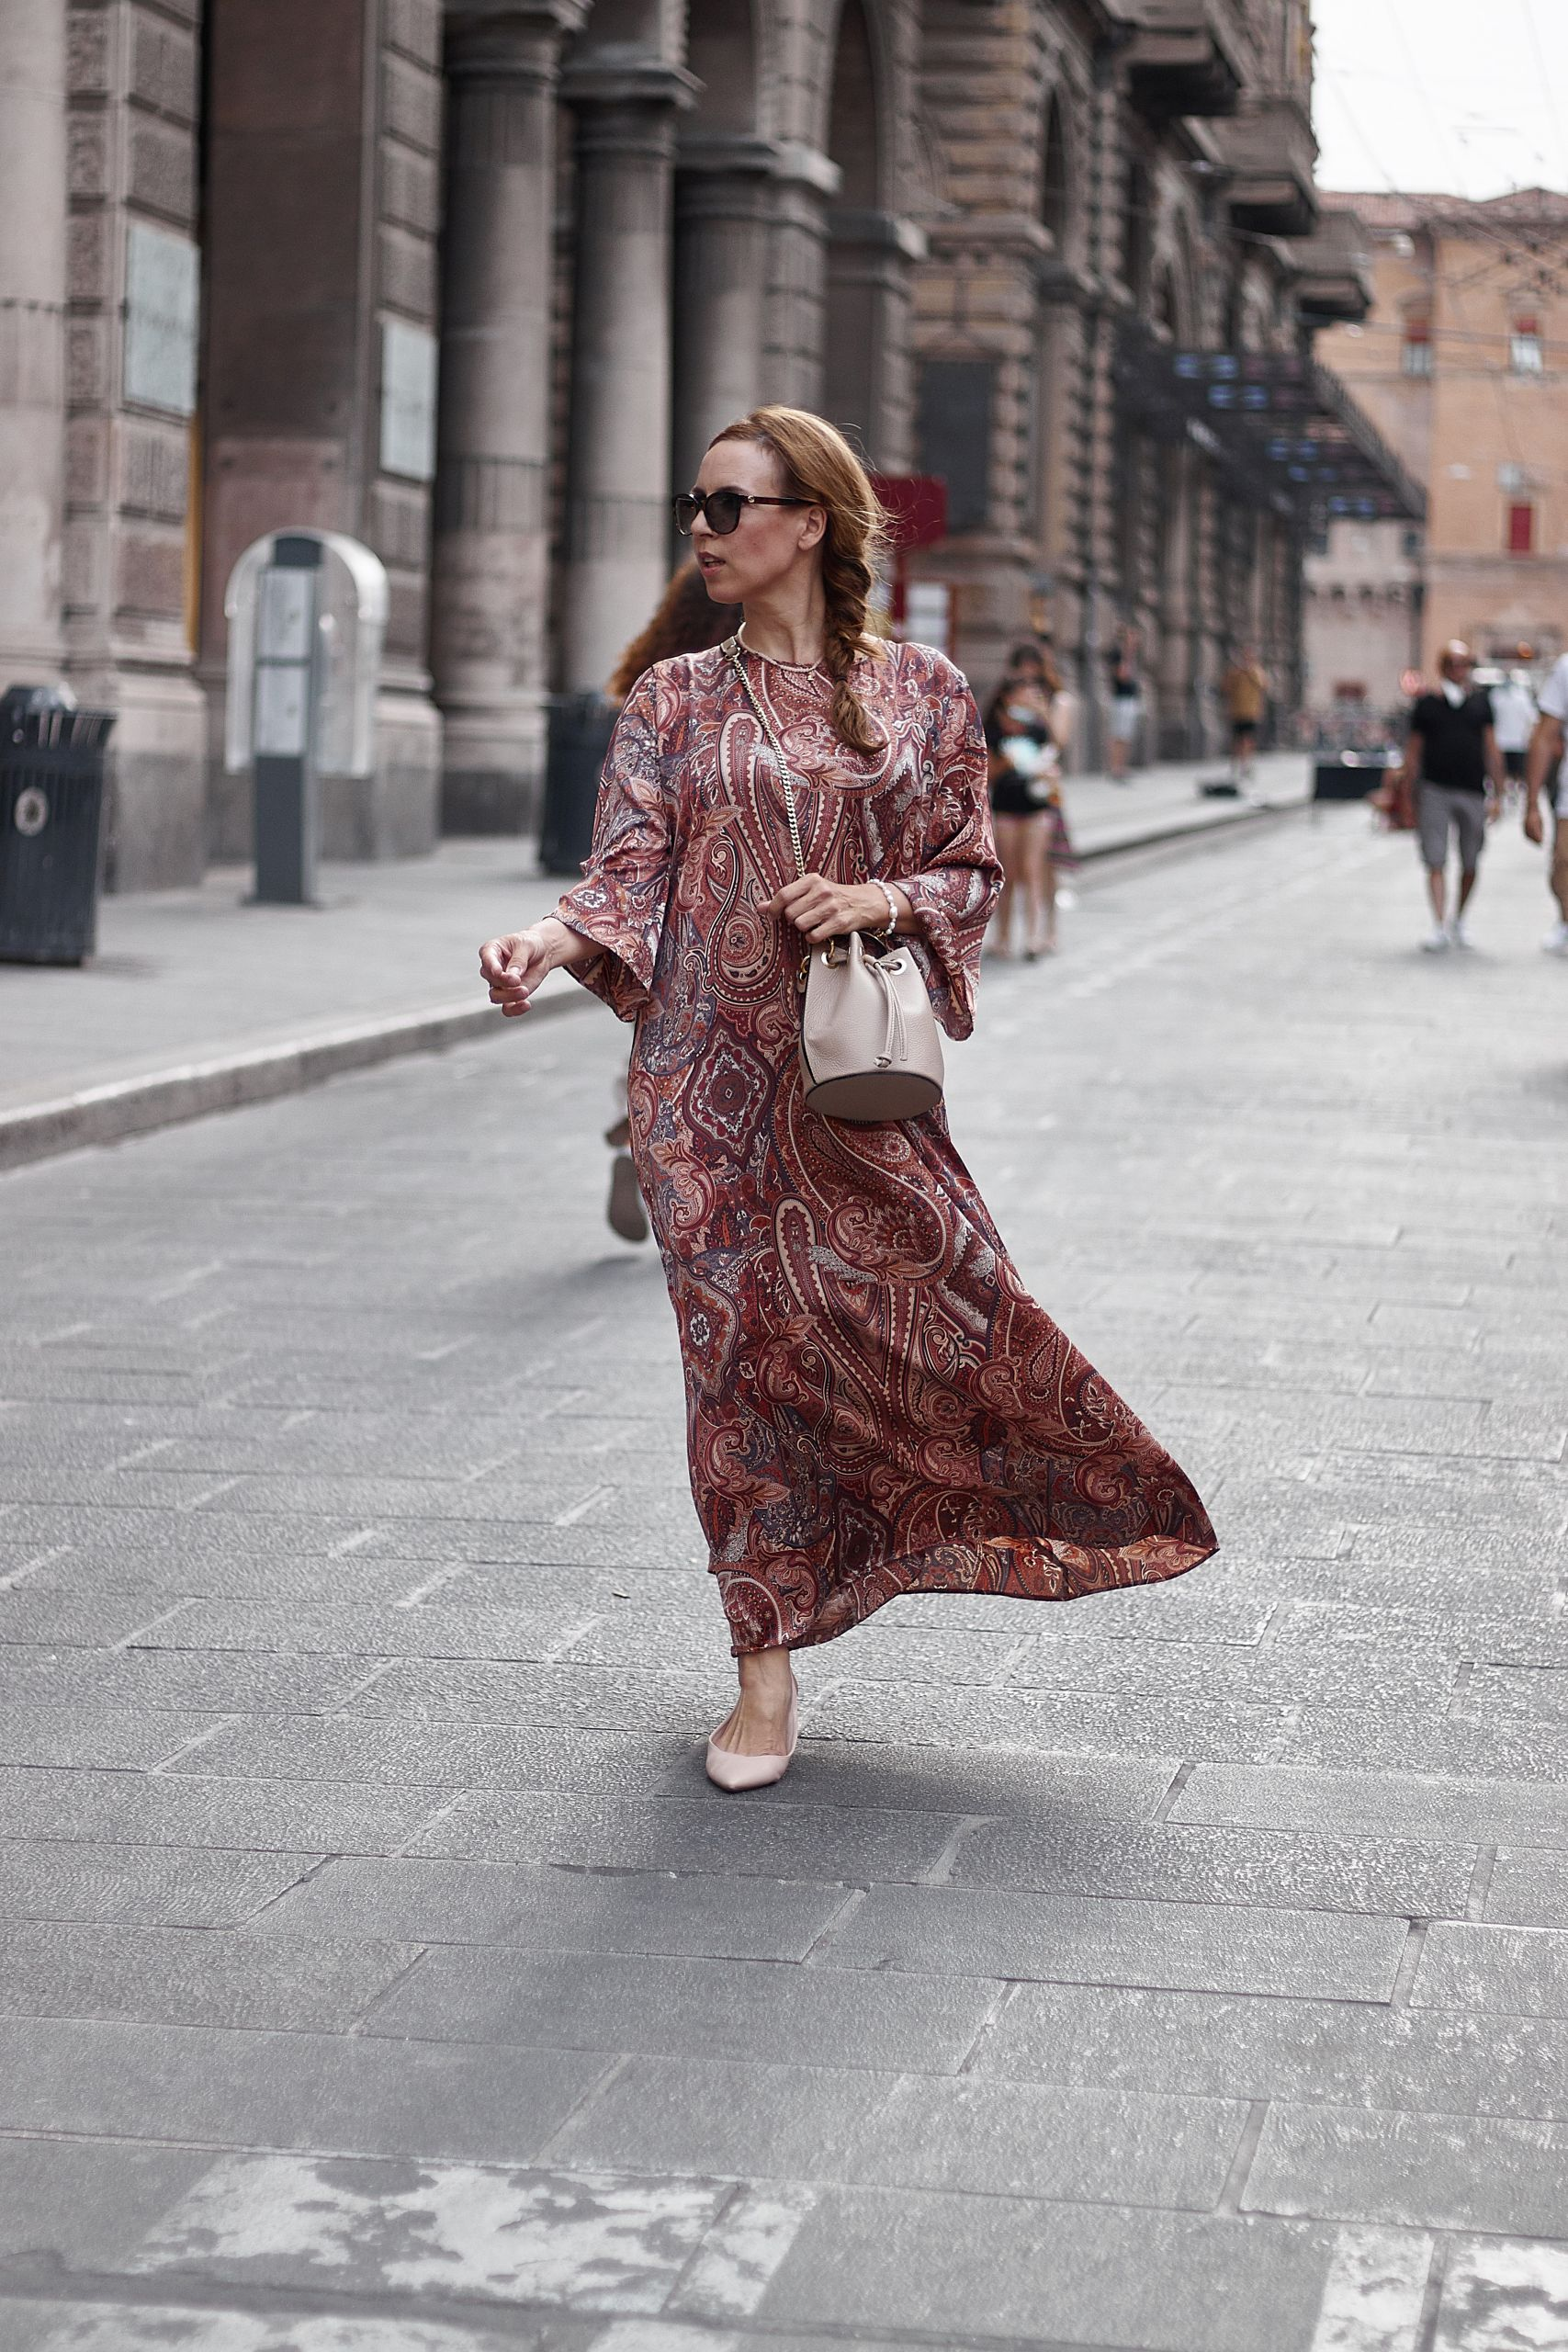 Settimo Cielo Bologna Kleid zu Ballerinas und Beuteltasche